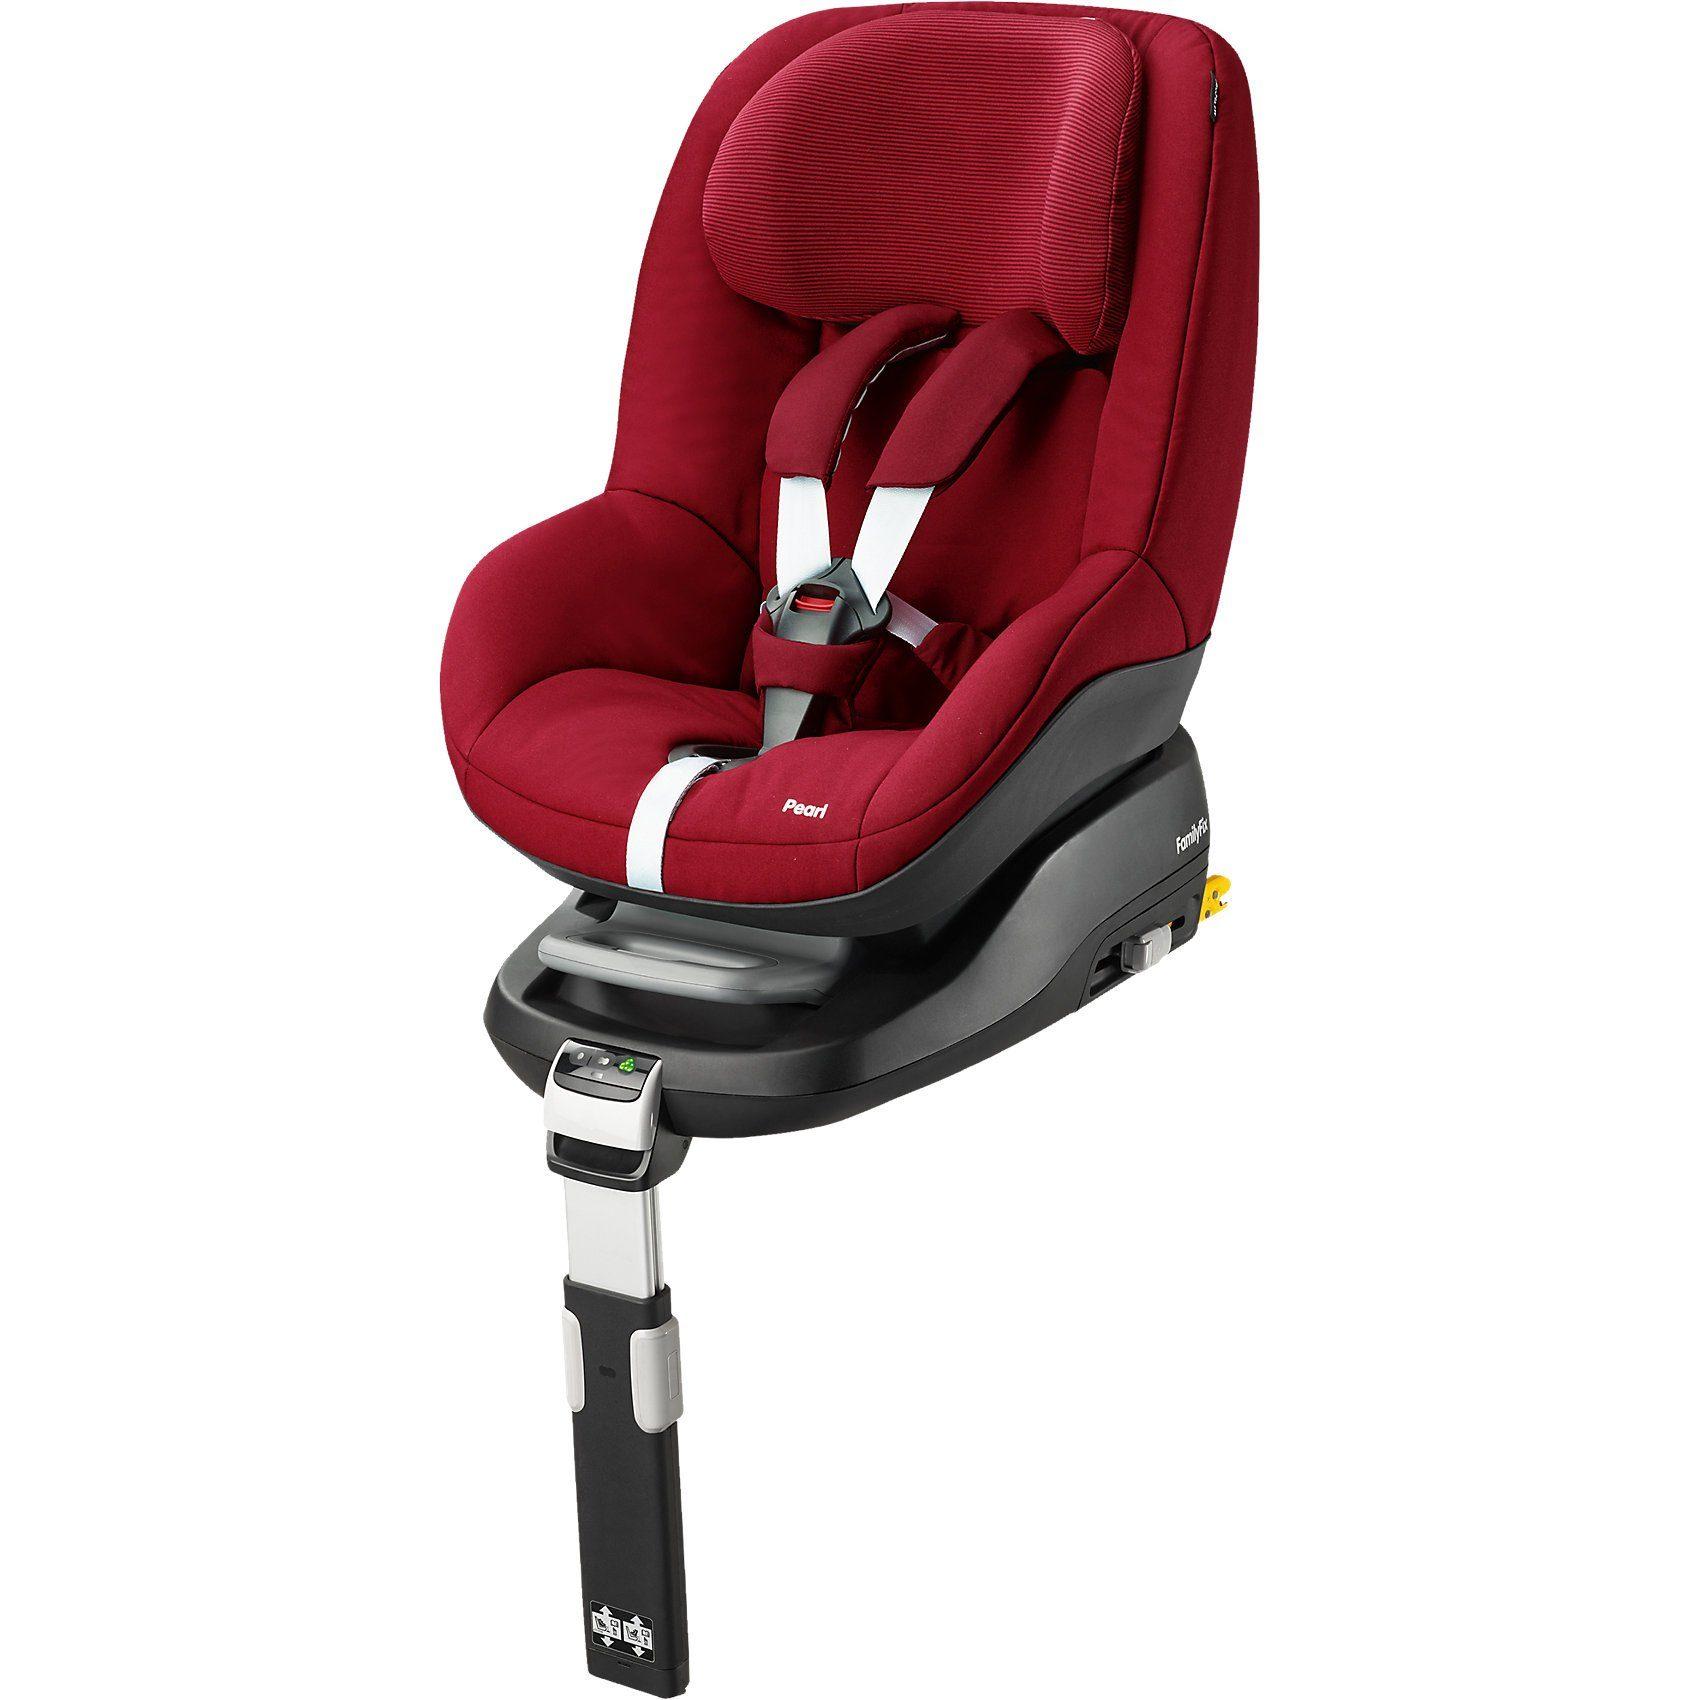 Maxi-Cosi Auto-Kindersitz Pearl, robin red, 2017